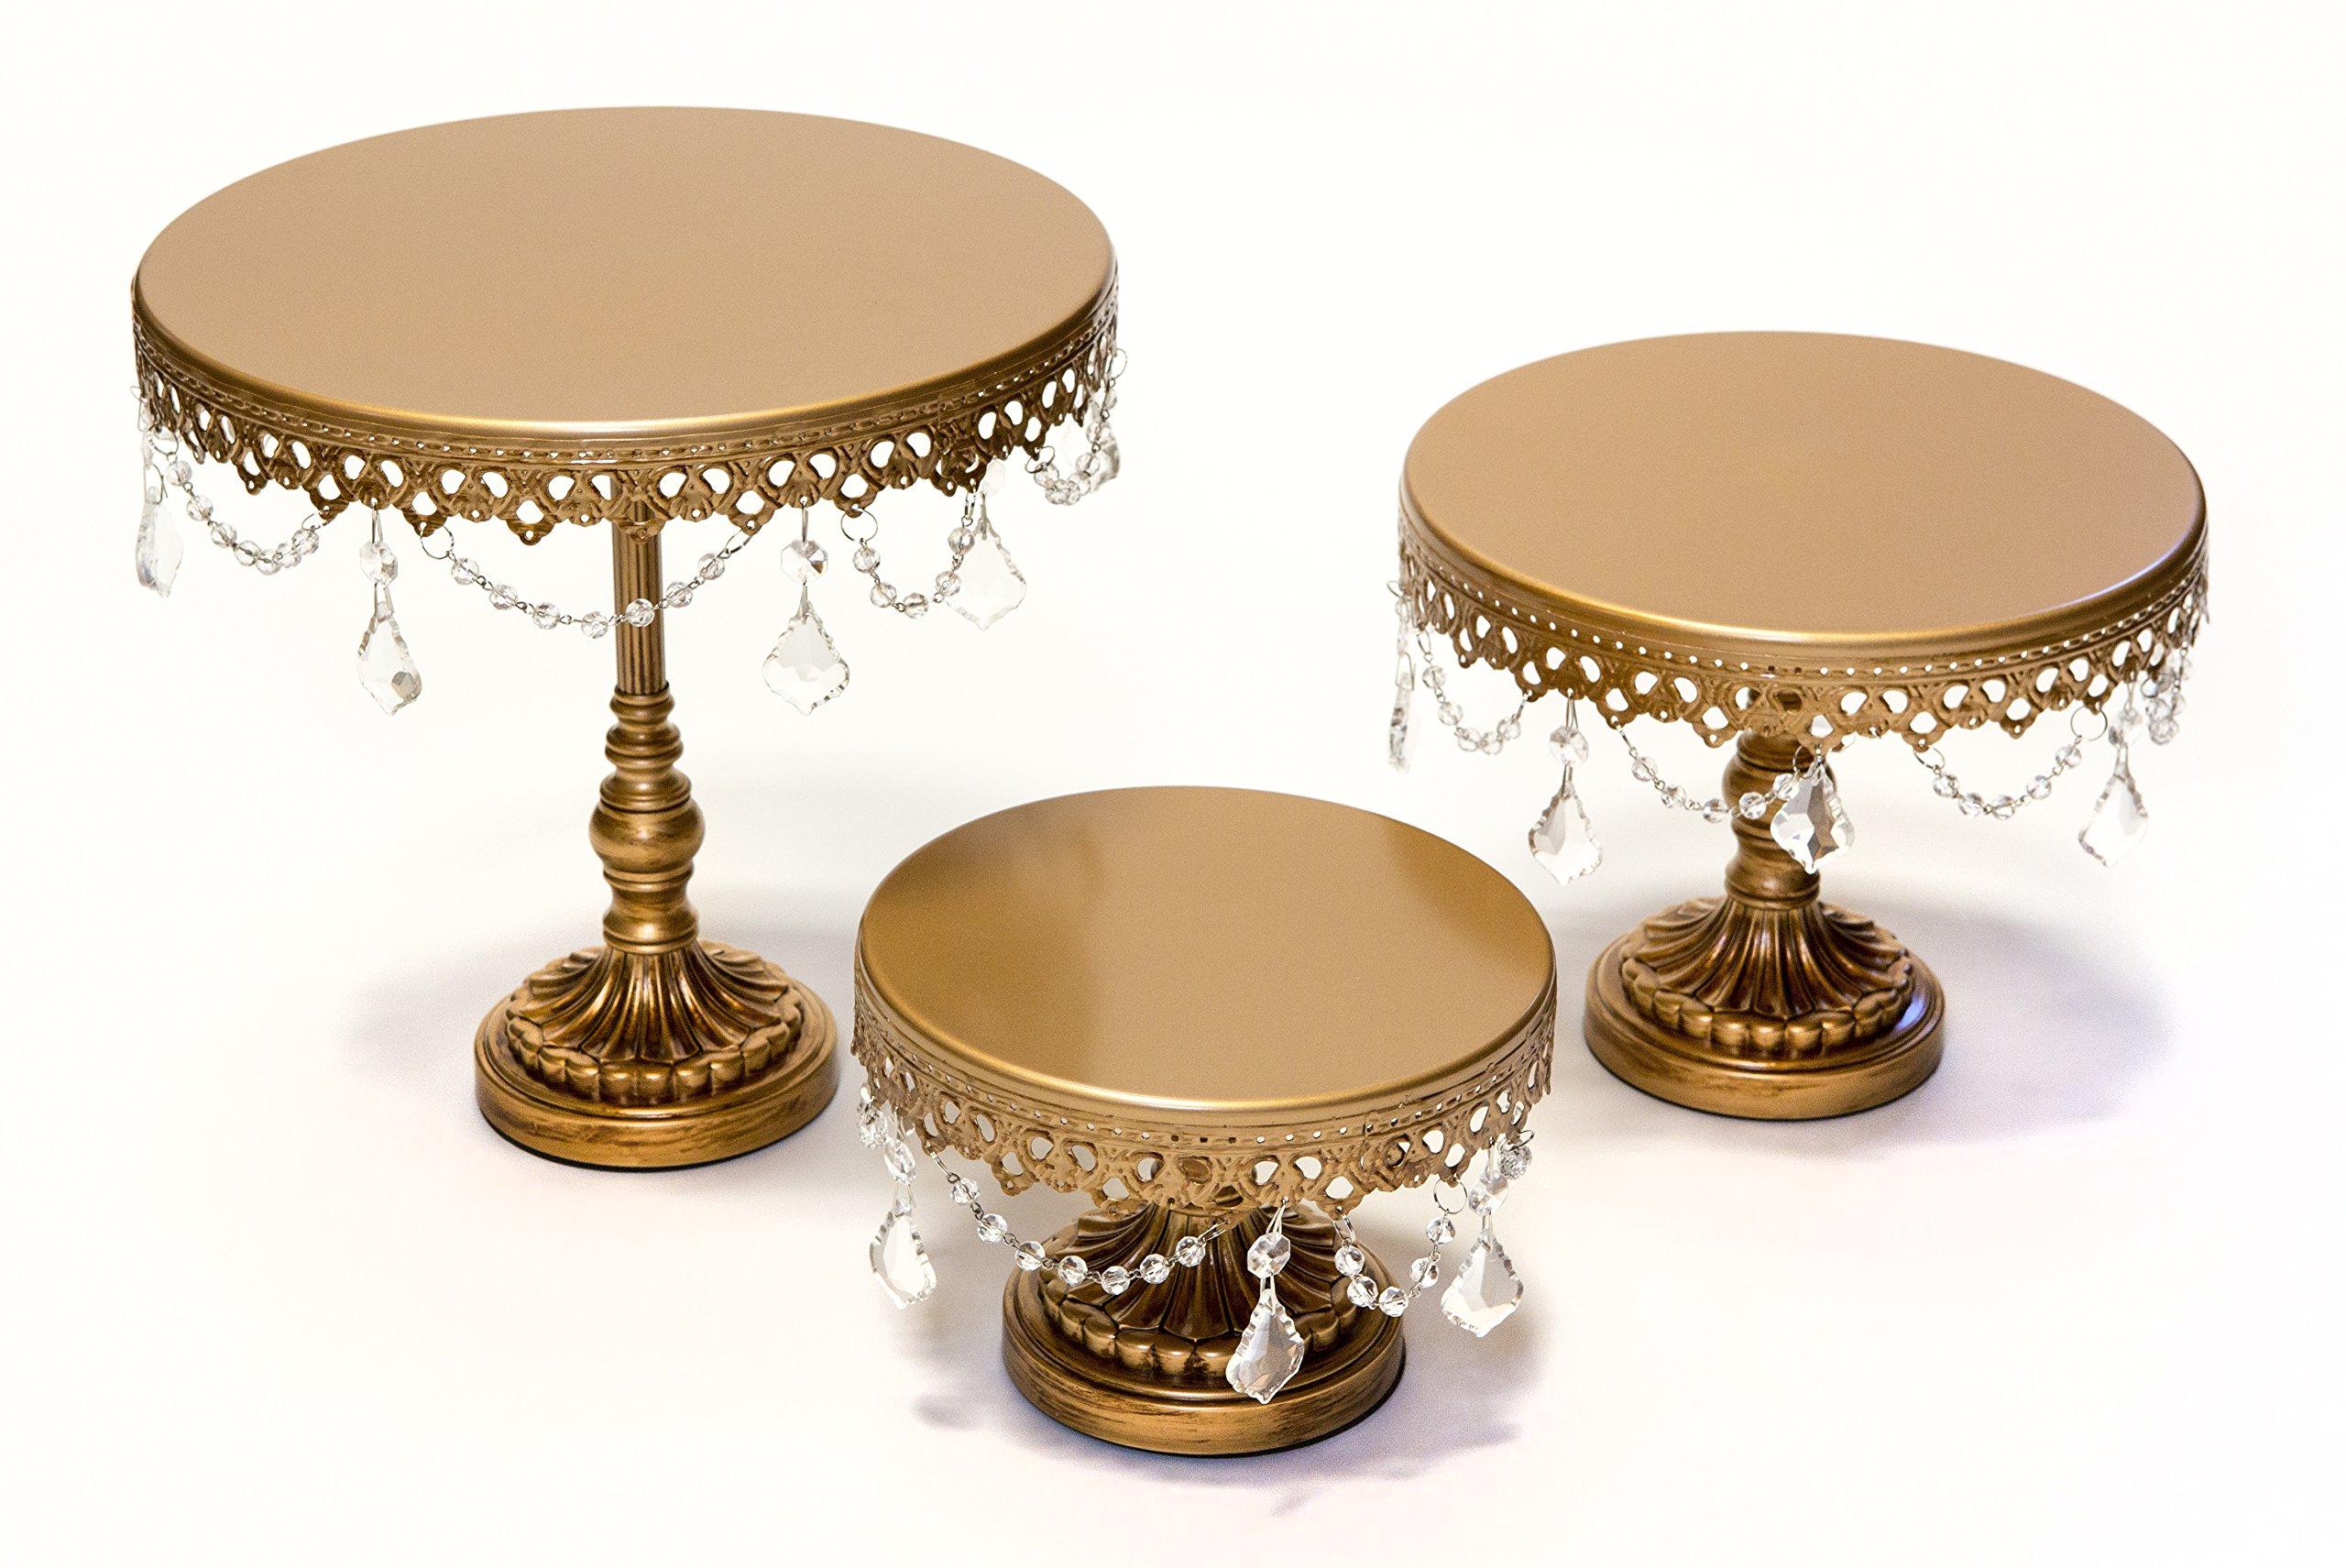 Opulent Treasures Chandelier Round Cake Plate Stands (Set of 3), Wedding Cake, Birthday Party Cupcake & Dessert Pedestal Stands(Antique Gold)